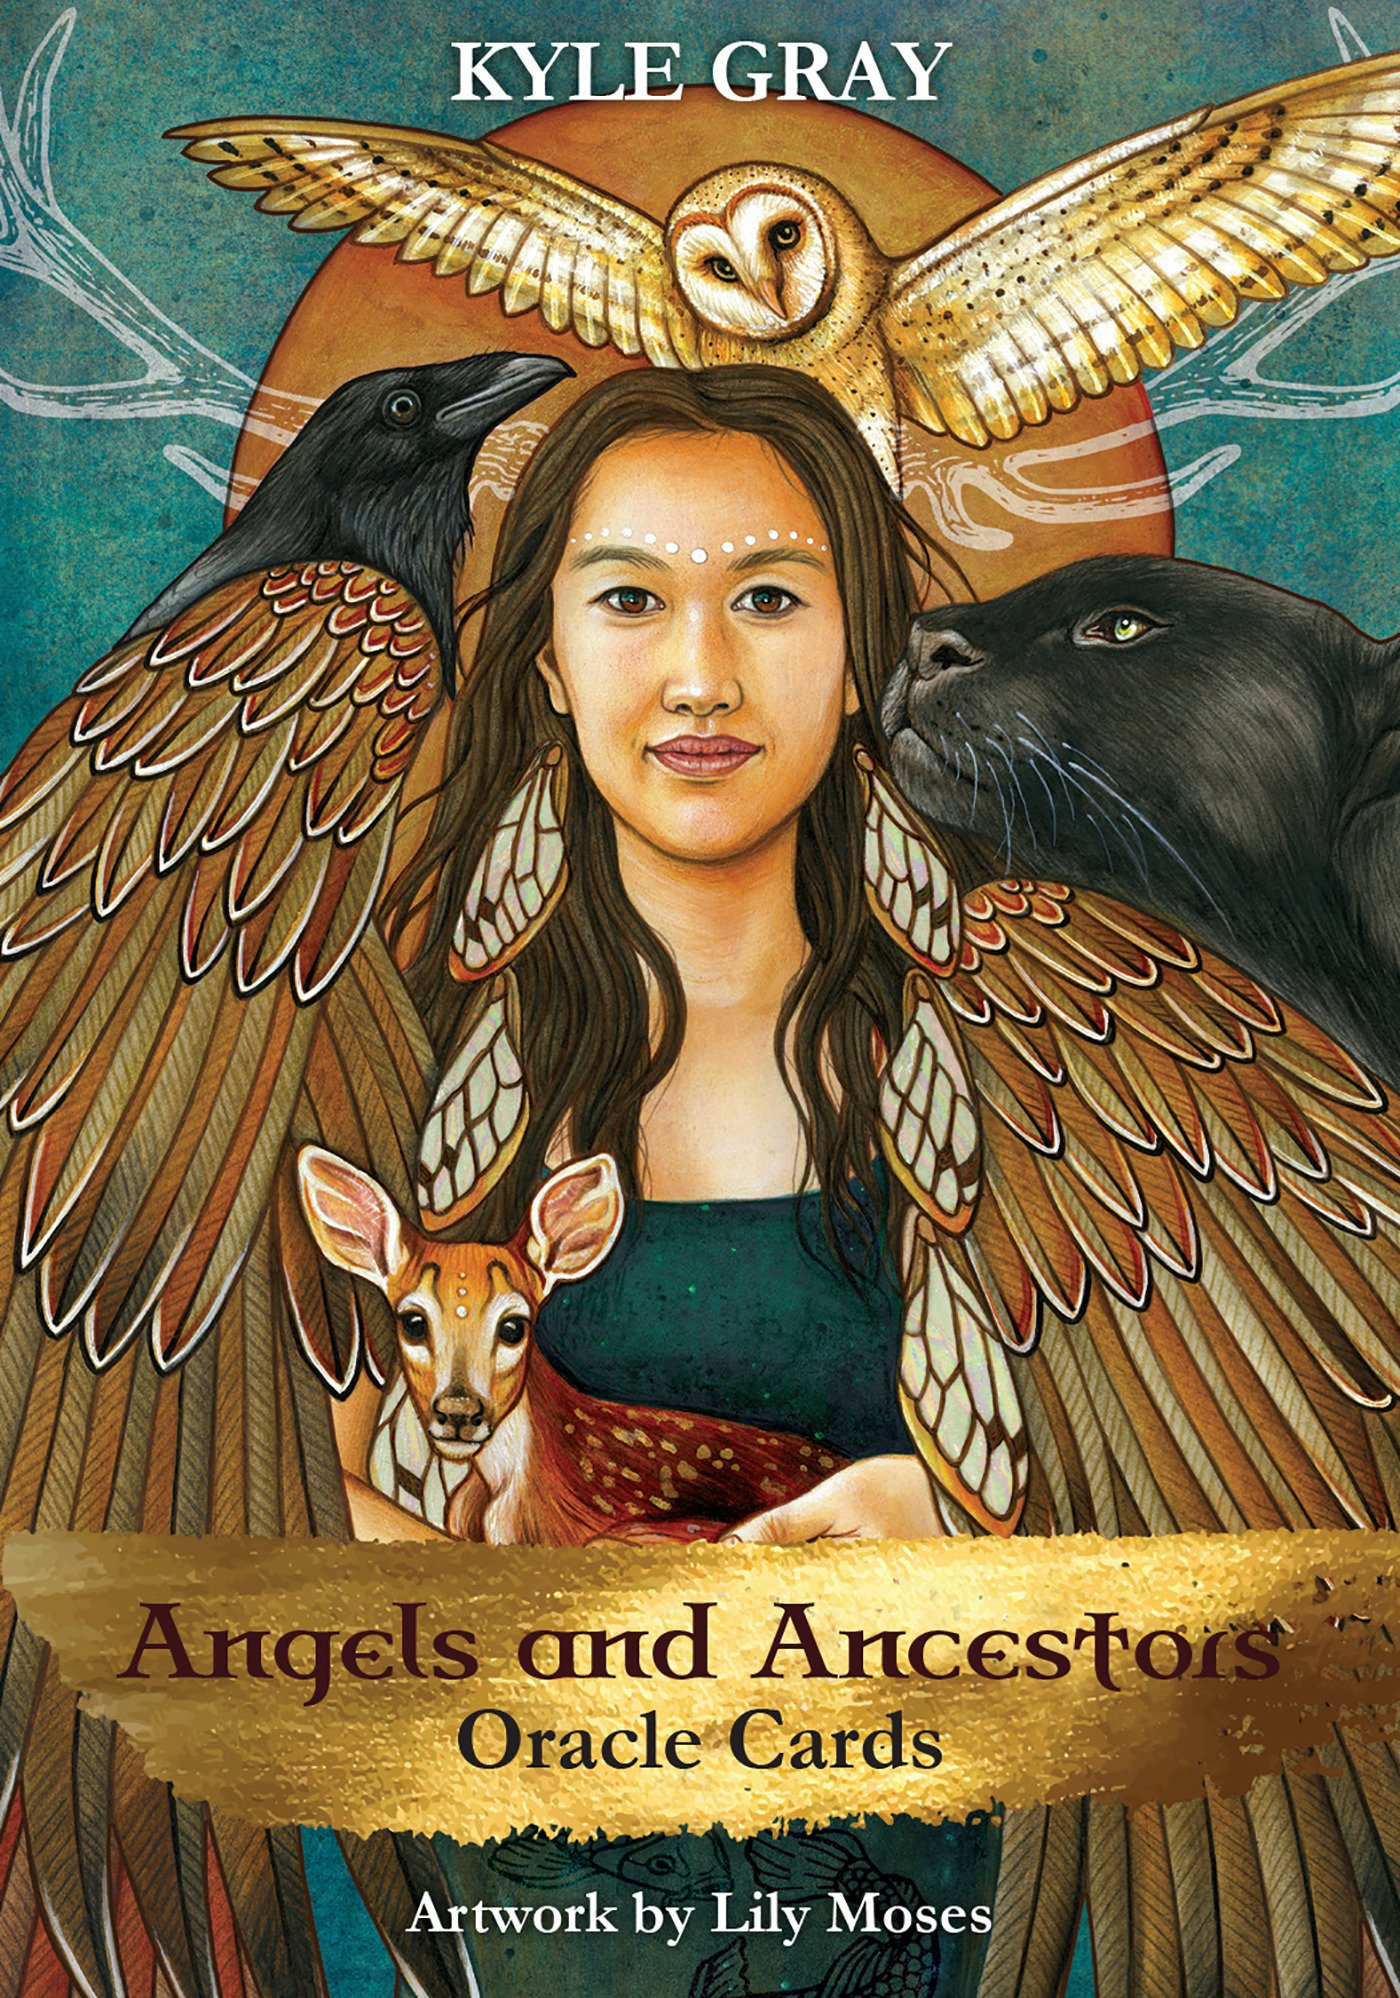 angels_and_ancestors.jpg